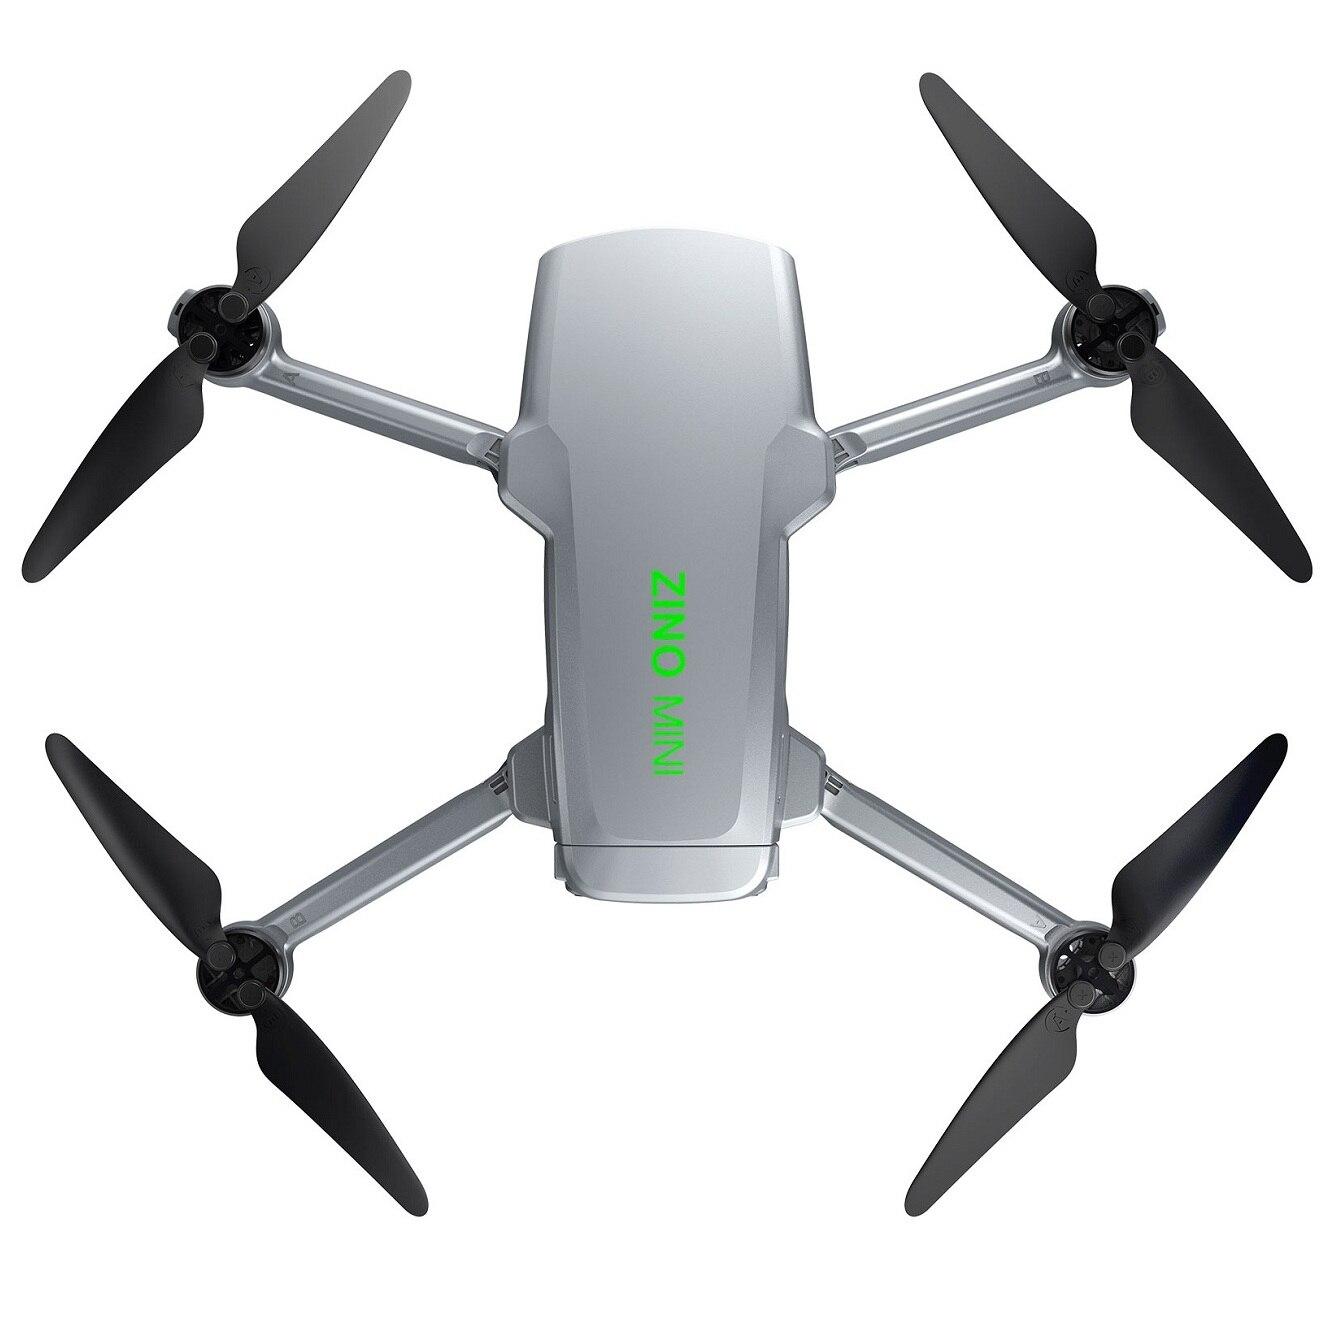 Hubsan Drone ZINO Mini PRO 249g GPS 10KM FPV 4K 30fps Camera 3-Axis Gimbal RC Quadcopter Discounts Code: LF15AS5OAPT5 2